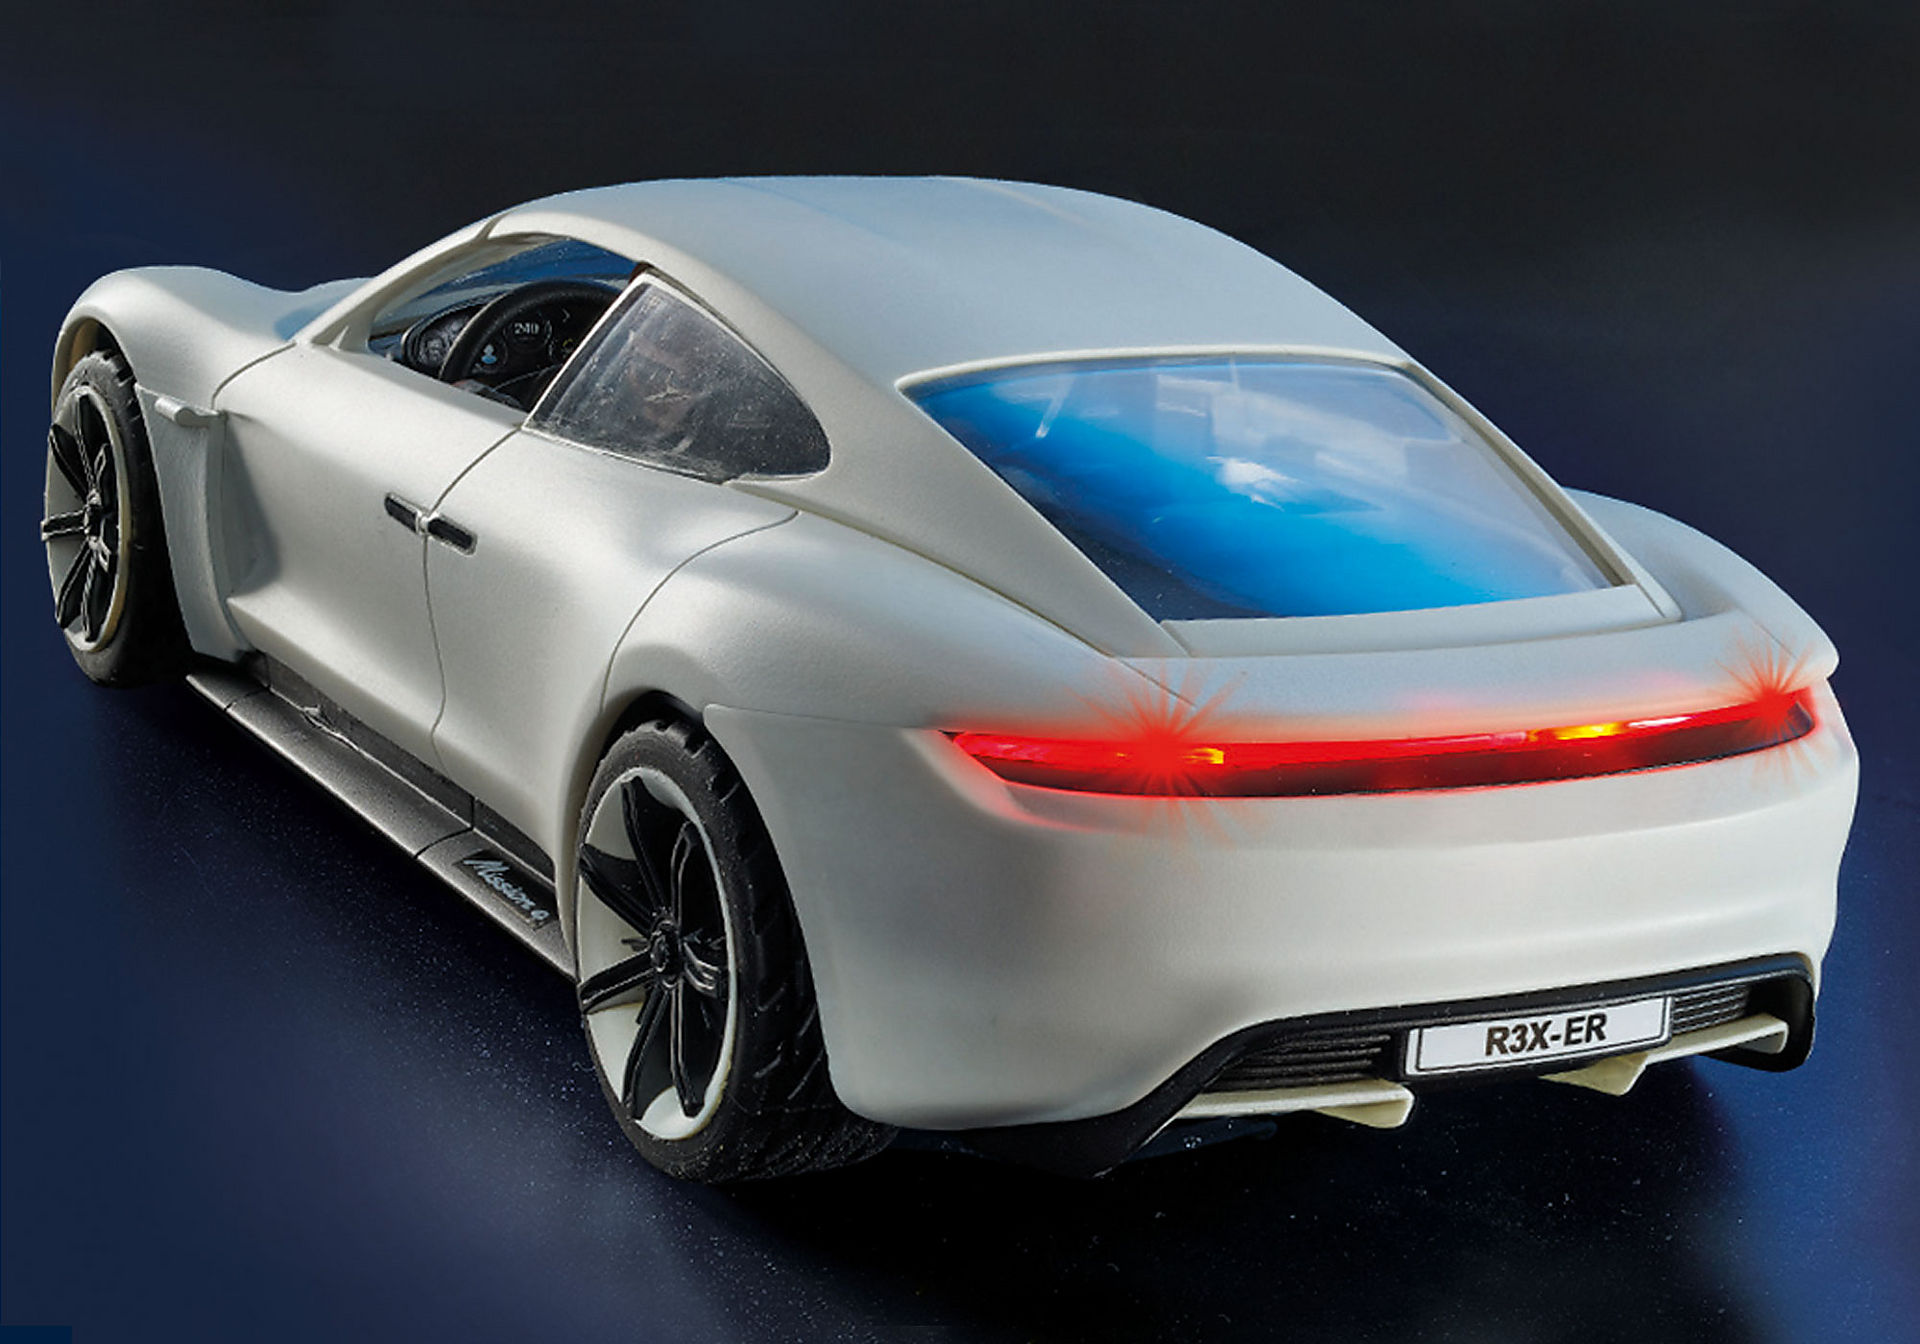 70078 PLAYMOBIL: THE MOVIE Ο Ρεξ Ντάσερ με την Porsche Mission E zoom image6